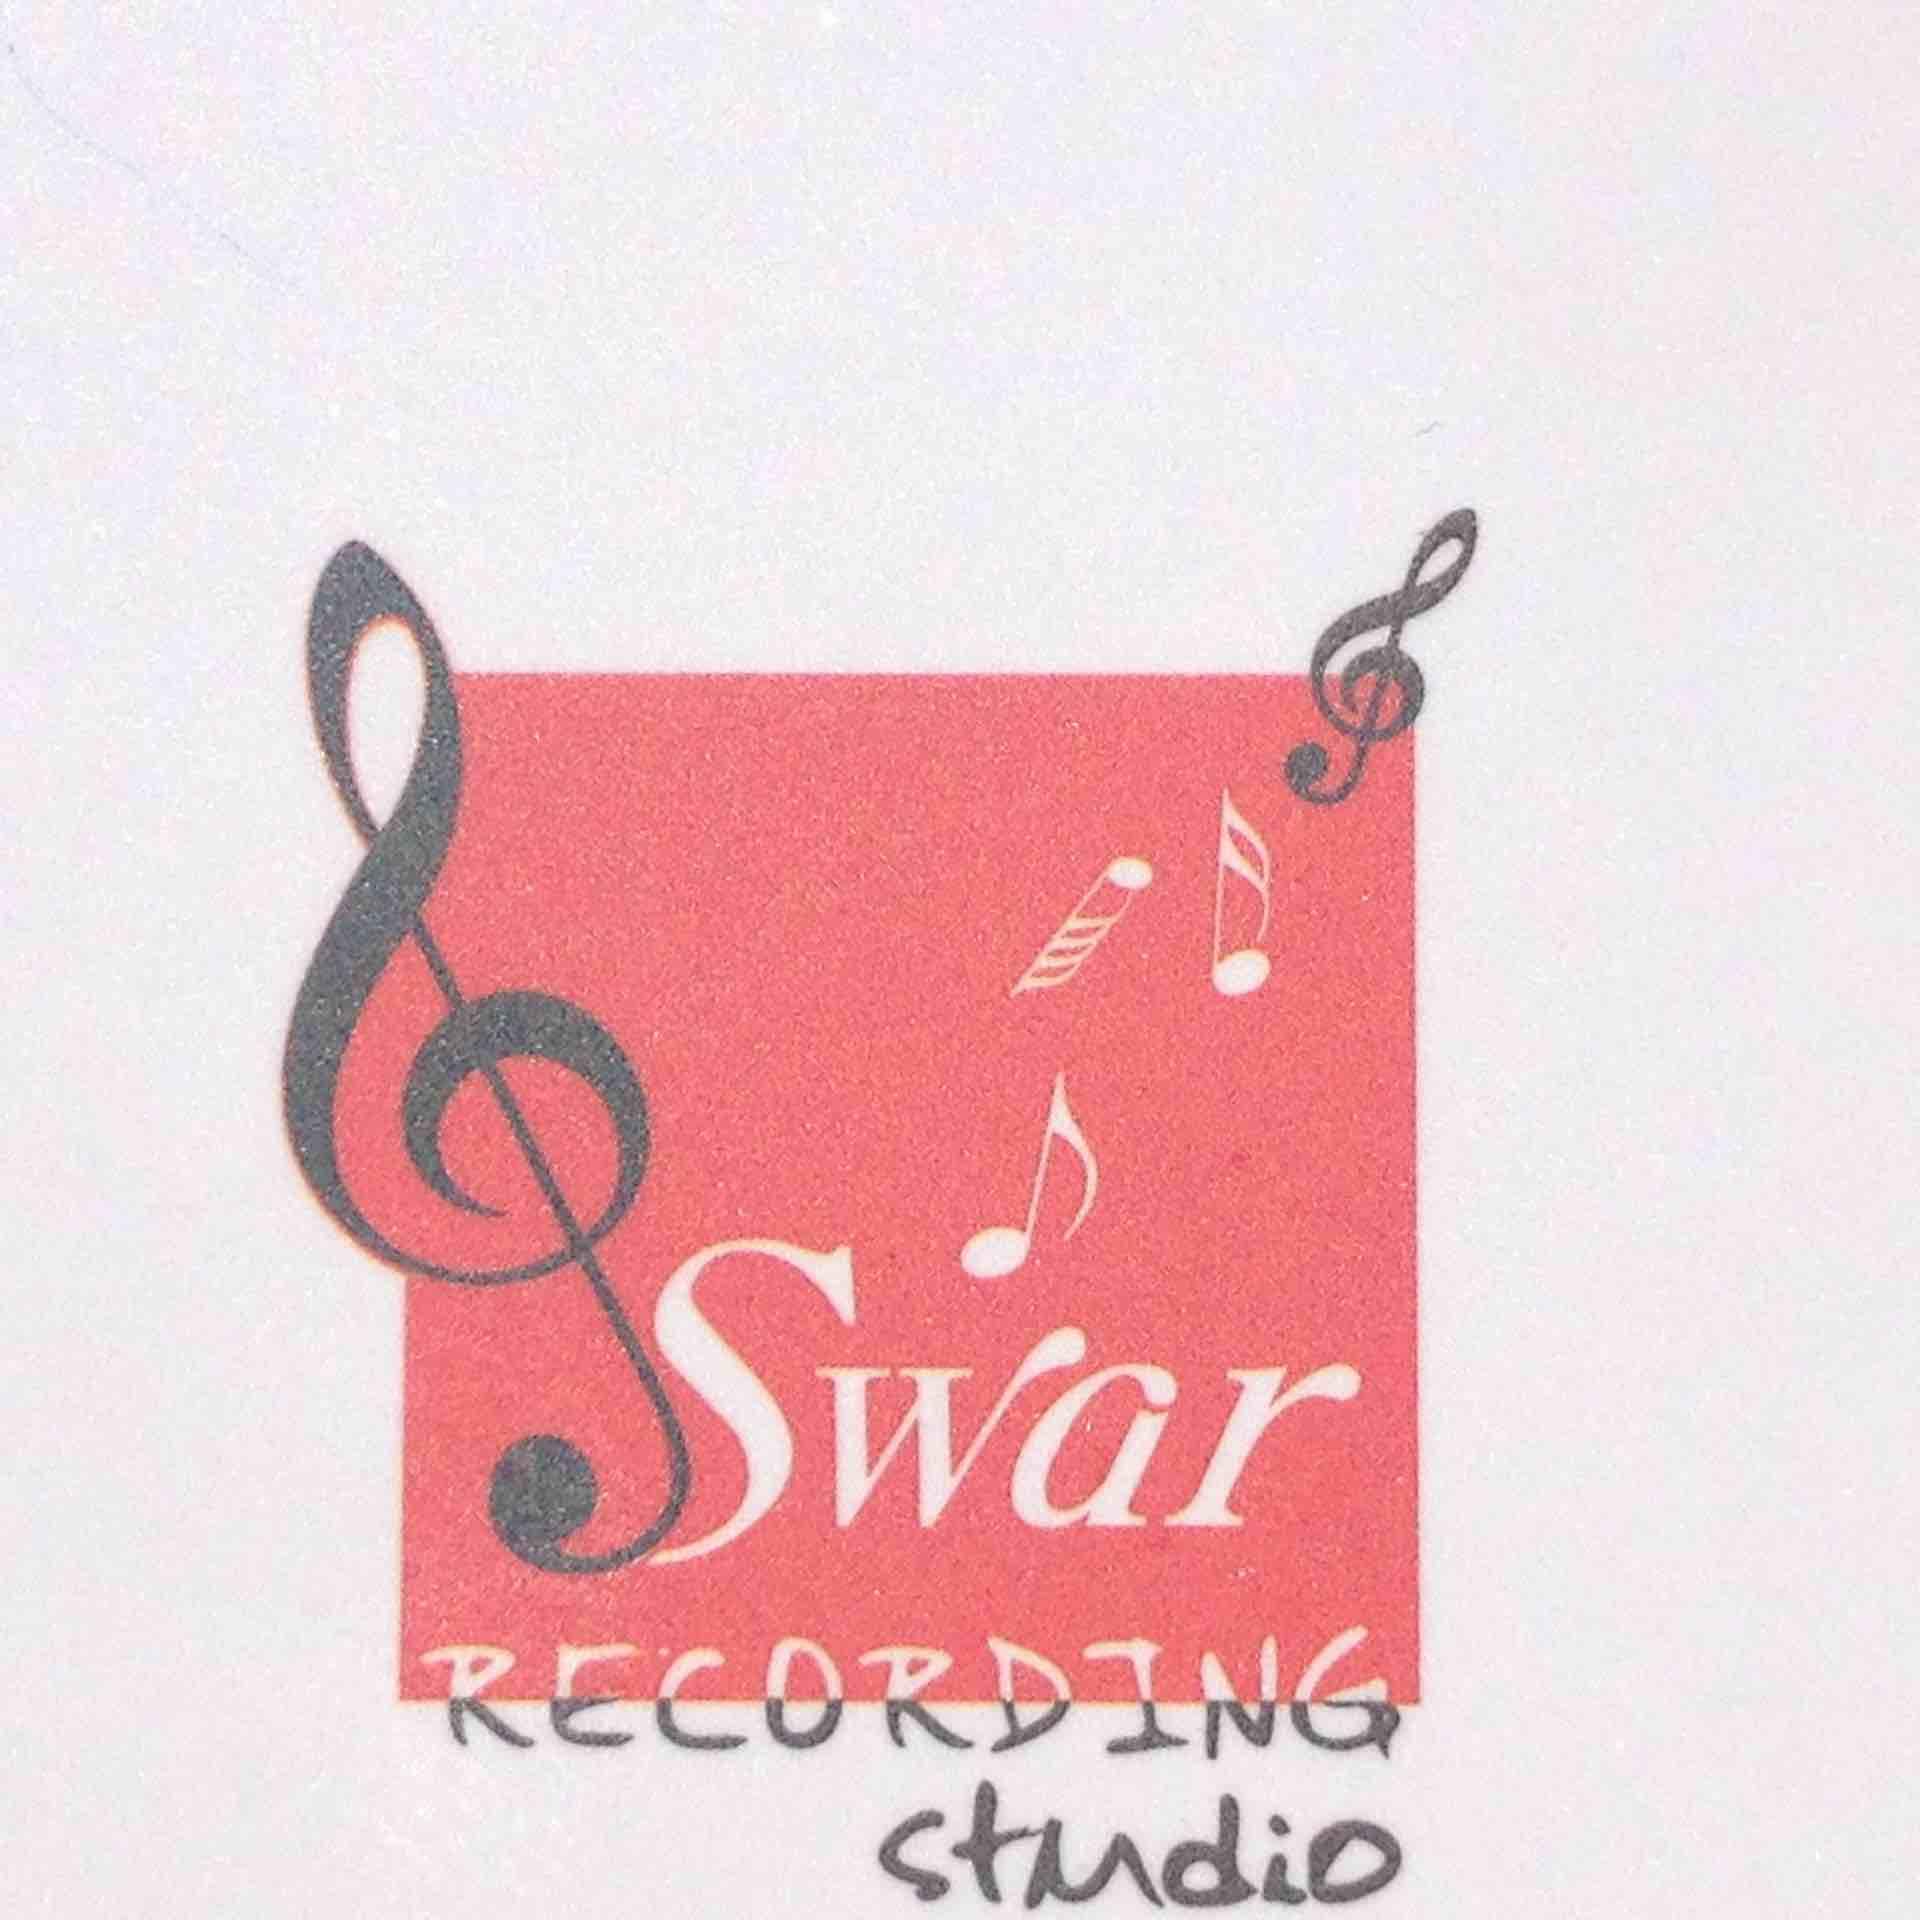 Swar Recording Studio